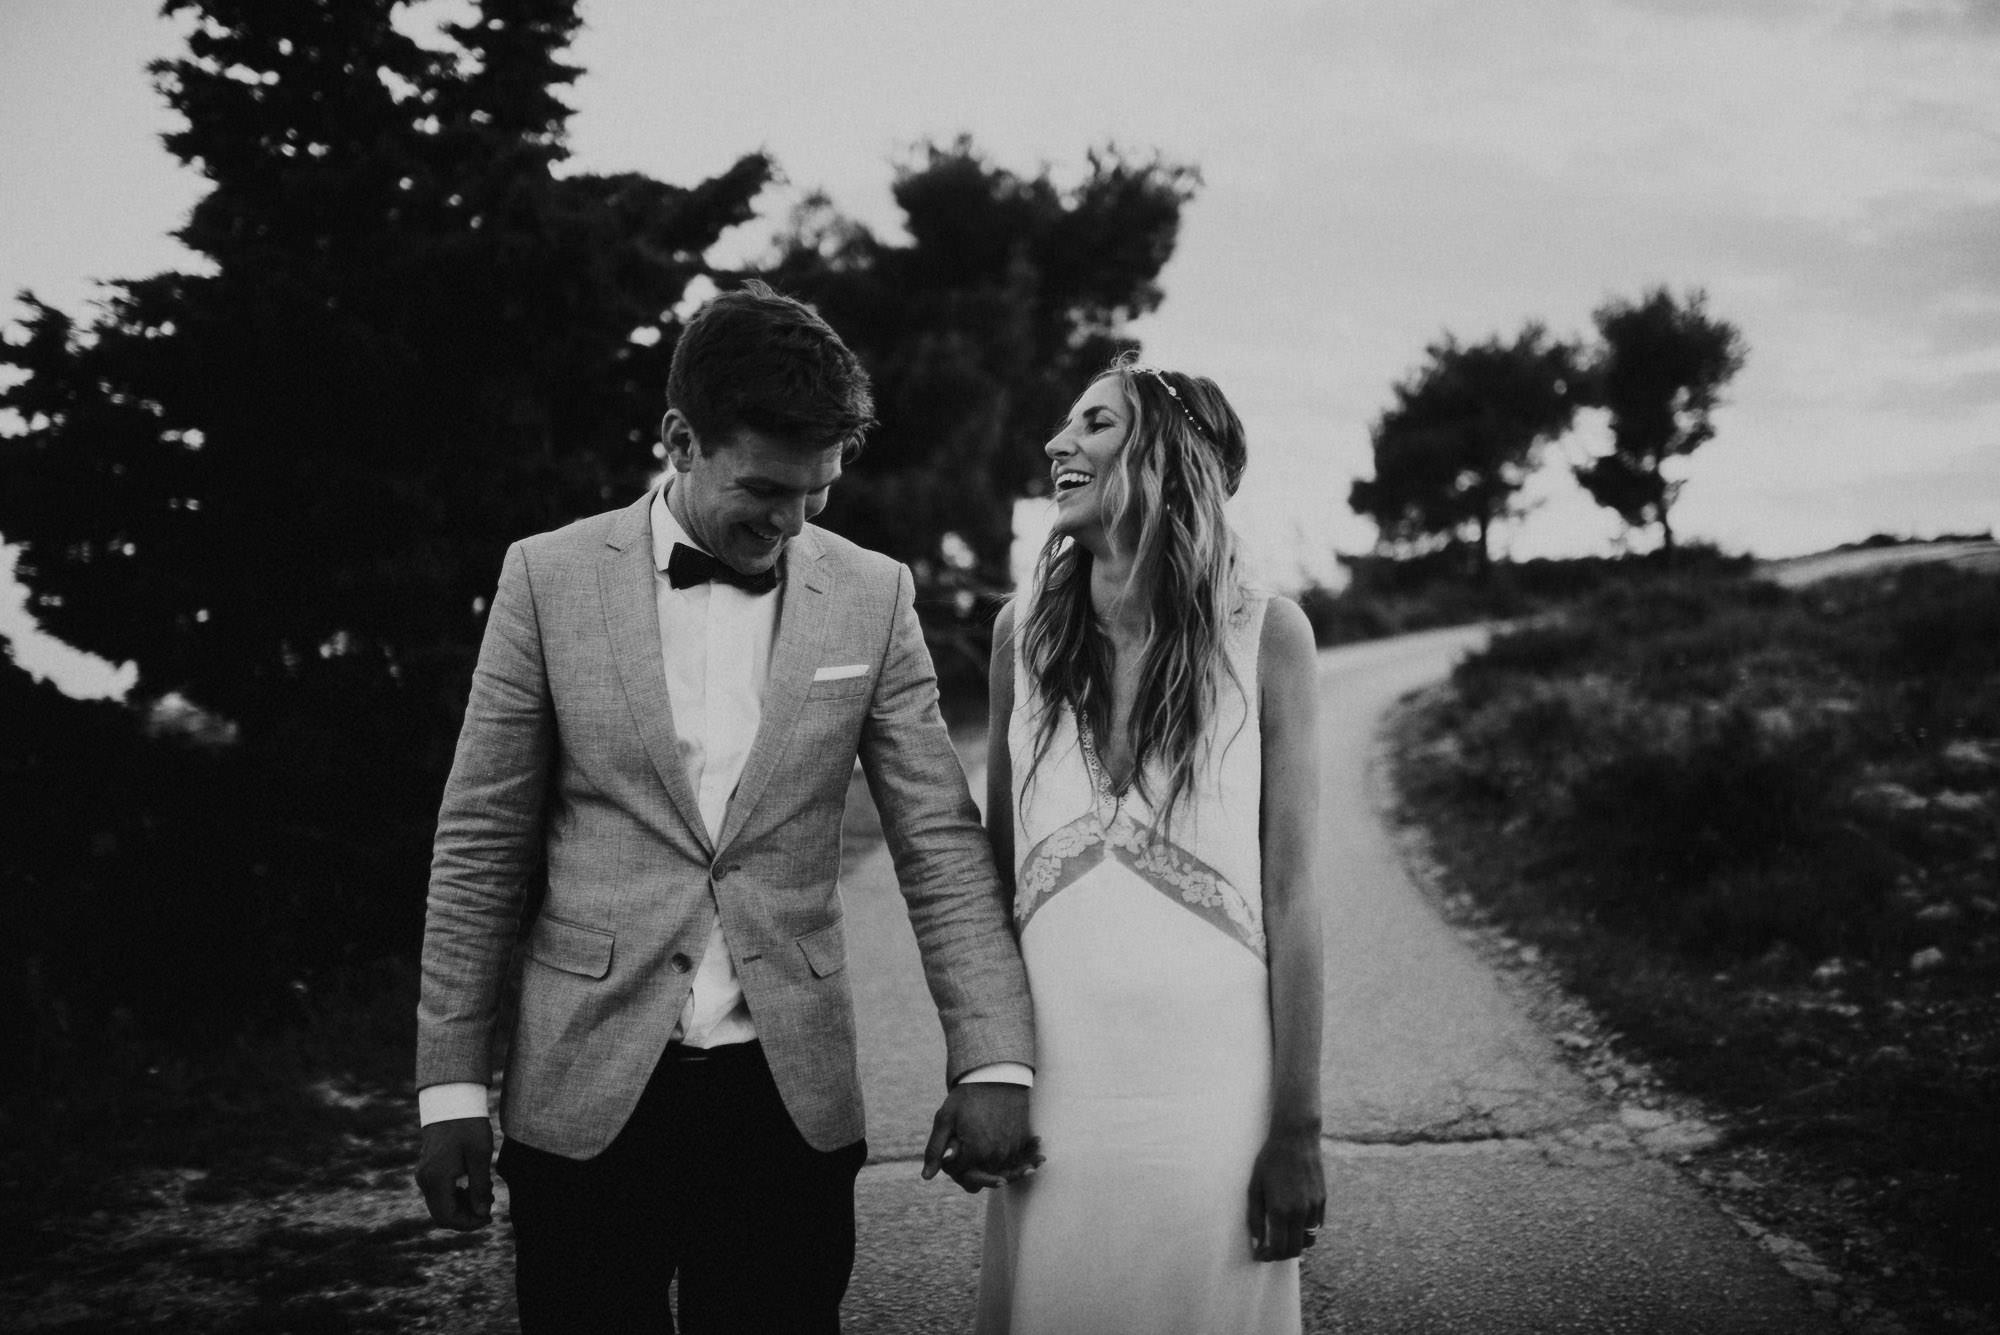 dubrovnik_croatia_wedding_photographer-jere_satamo-destination_weddings-118-web.jpg